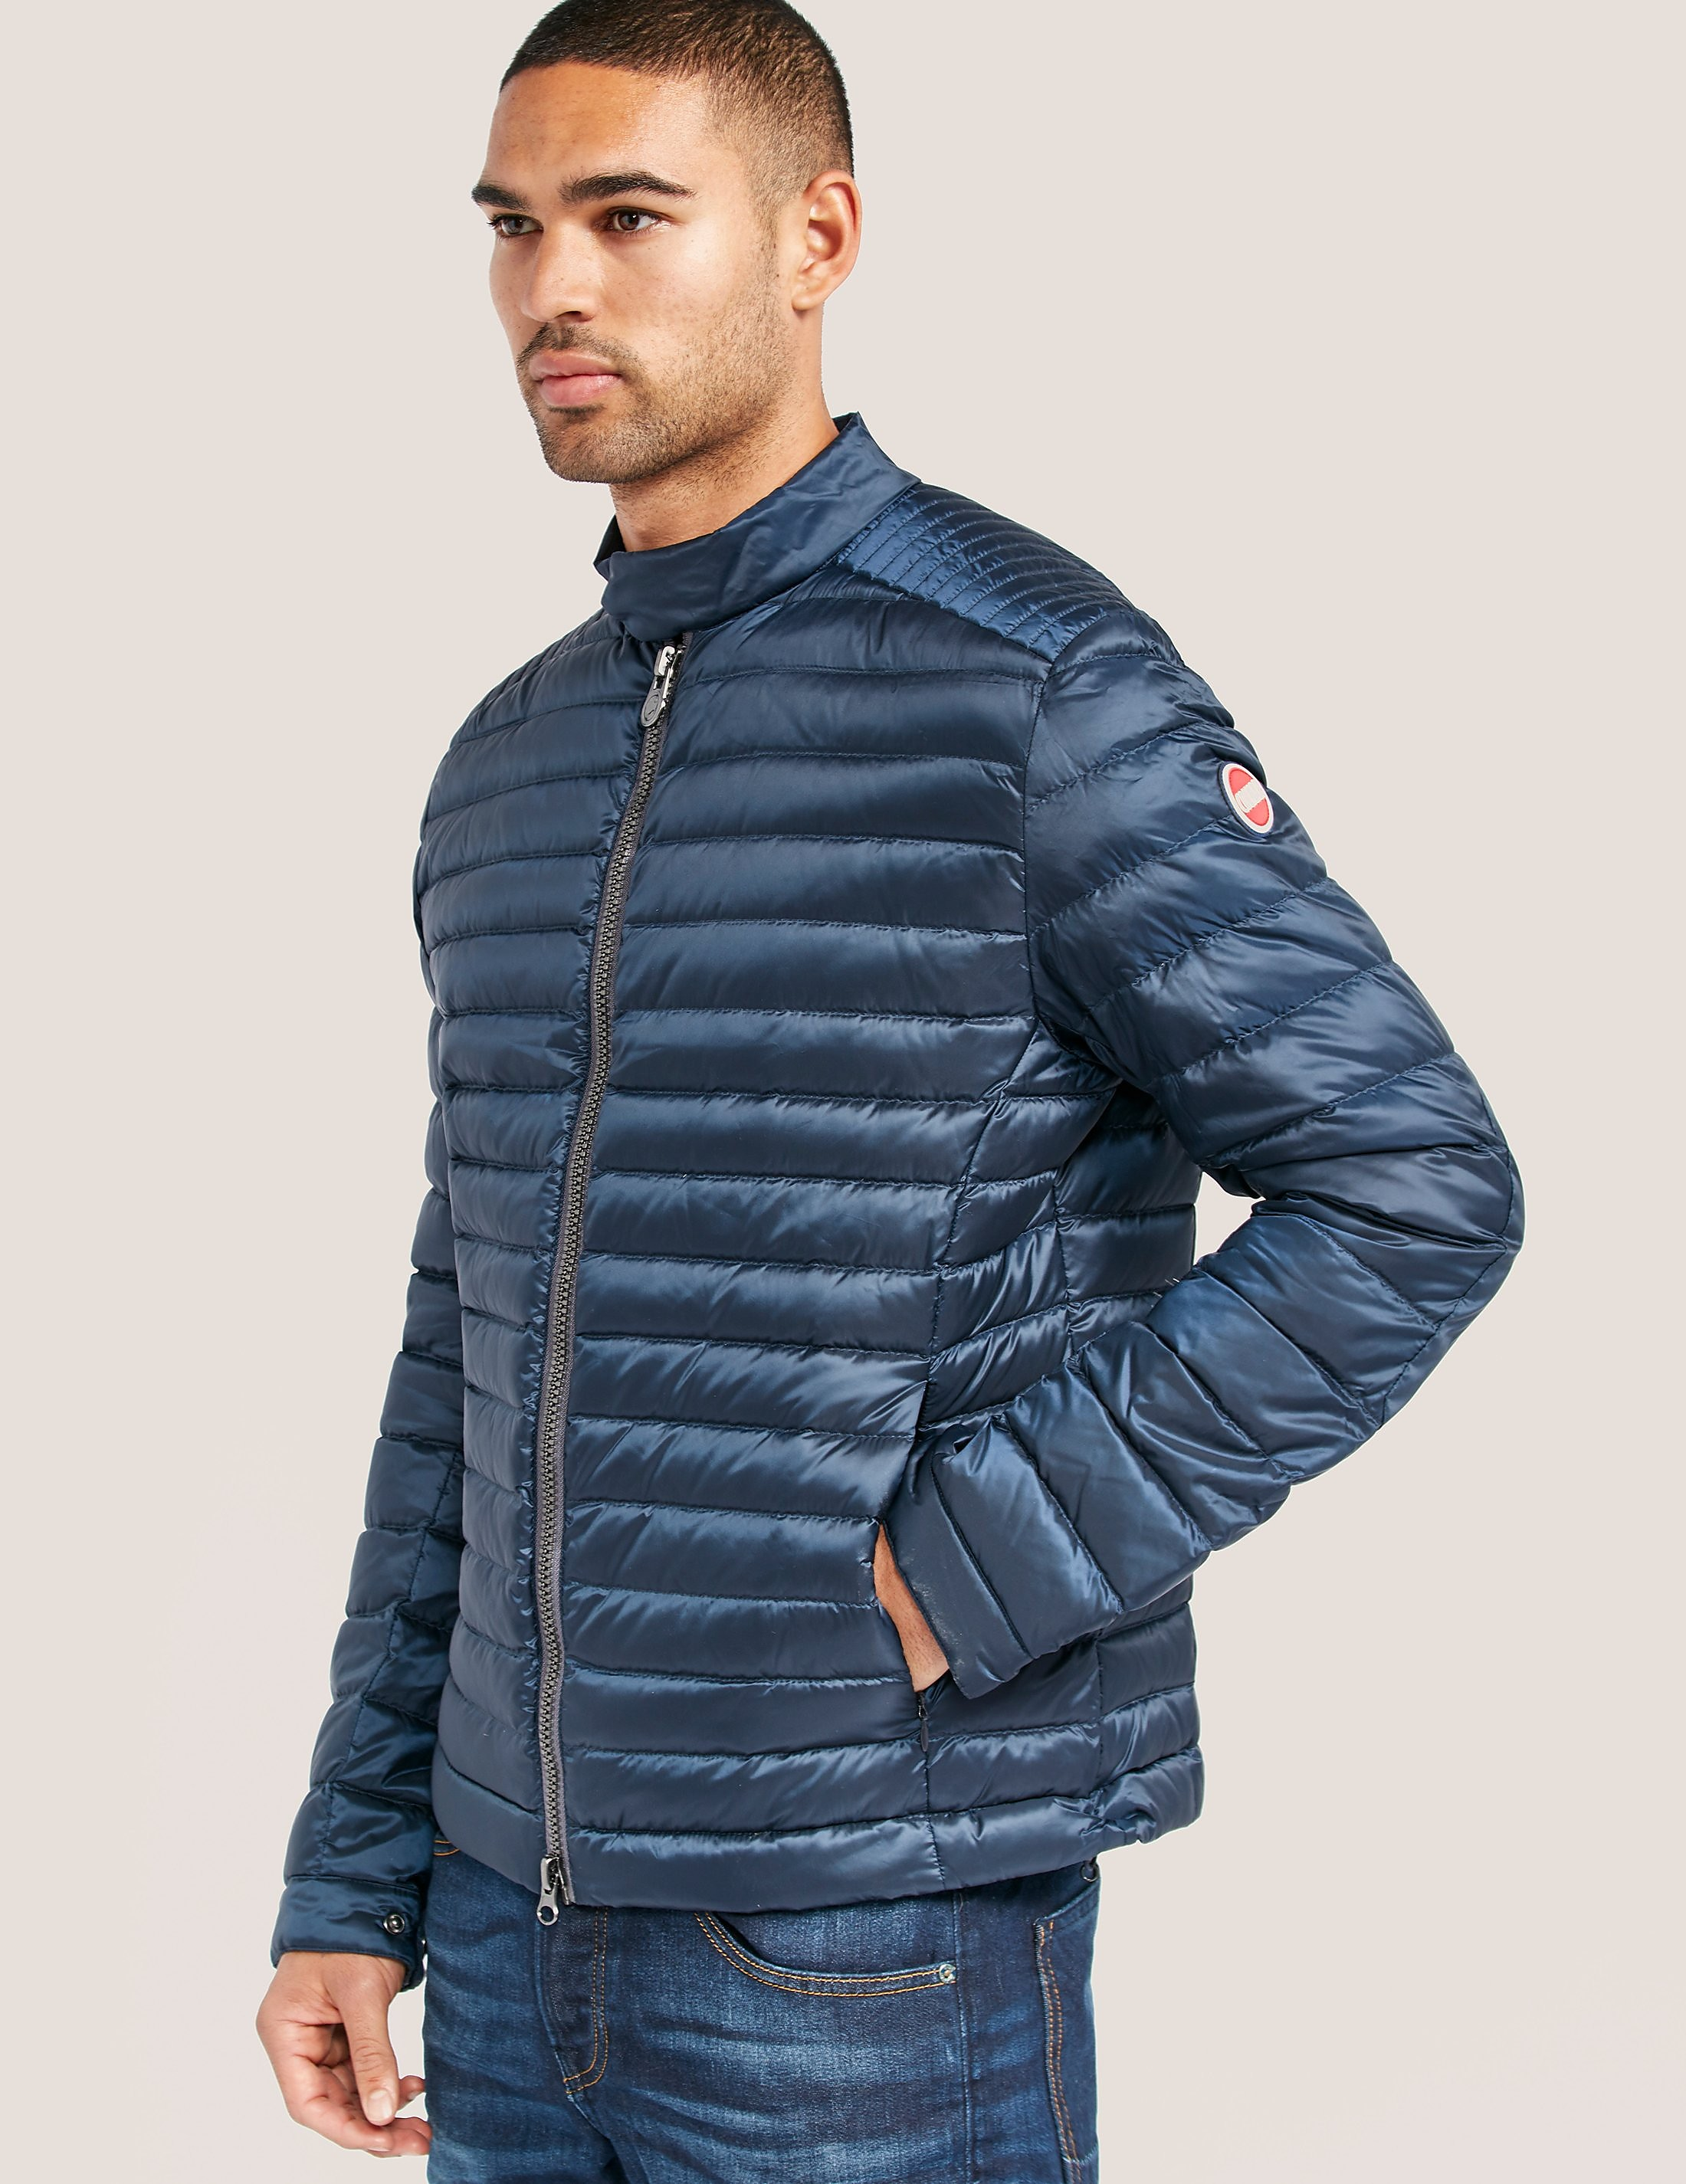 Colmar Biker Jacket